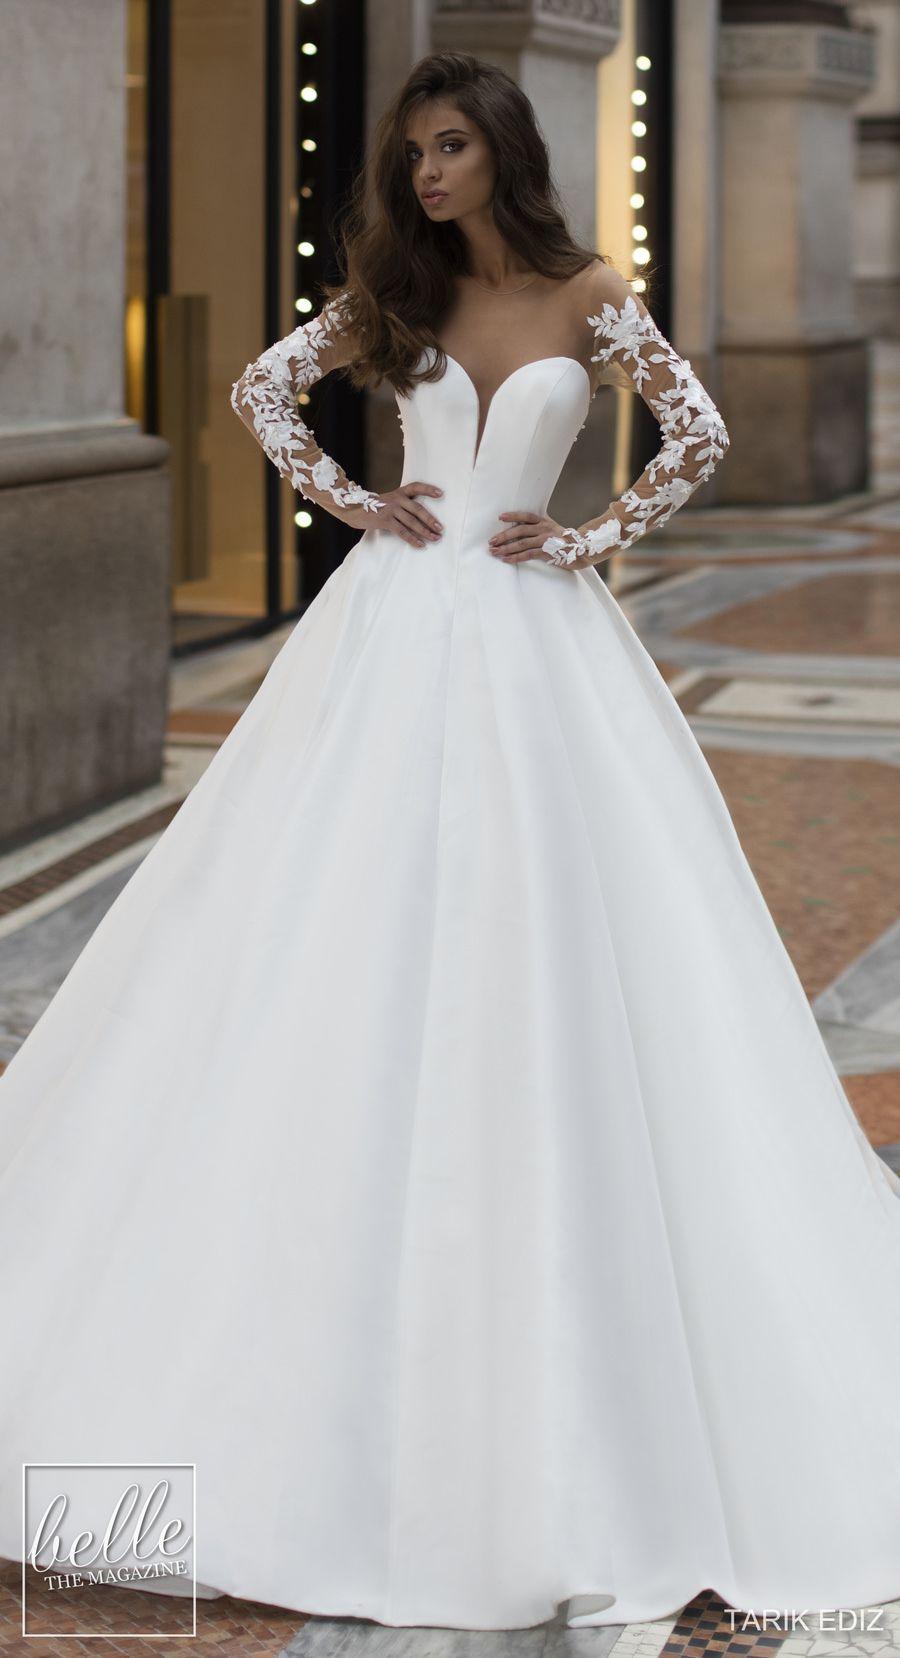 Tarik Ediz Wedding Dresses 2019 Belle The Magazine Wedding Dress Long Sleeve Wedding Dresses Ball Gown Wedding Dress [ 1658 x 900 Pixel ]